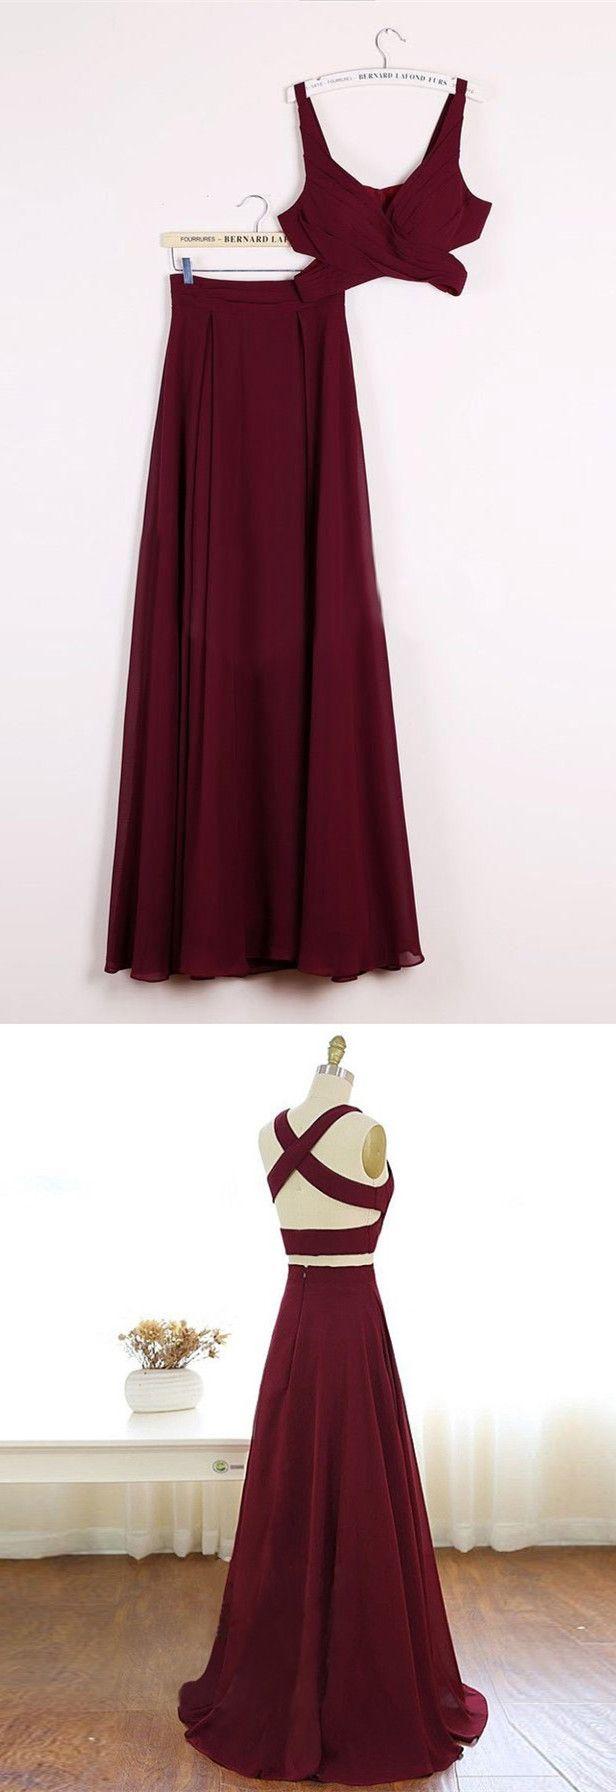 Two piece v neck long burgundy chiffon prom dress evening dress